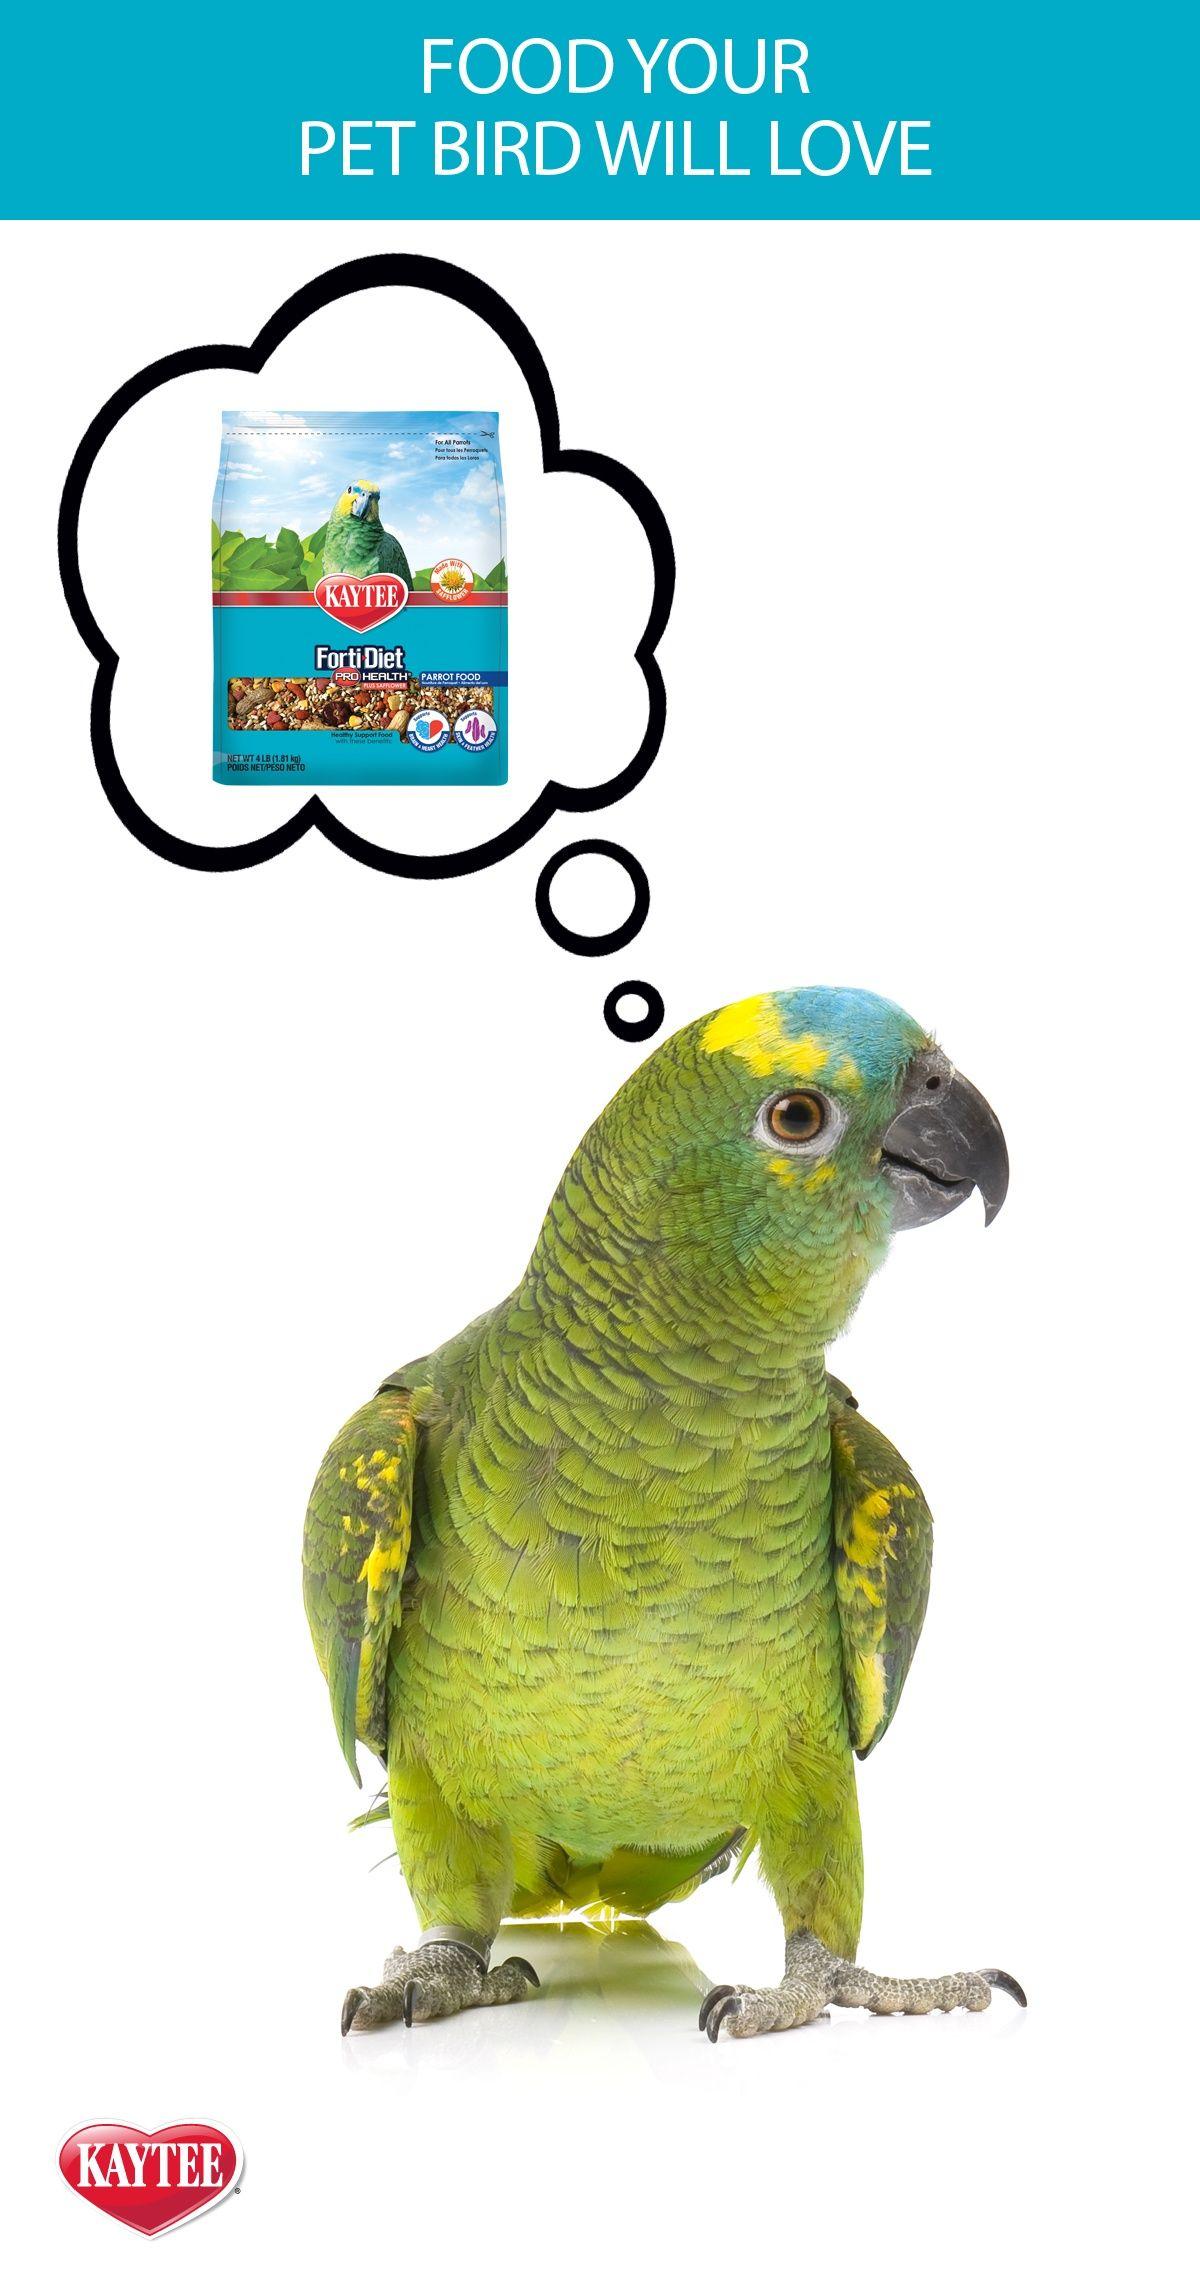 Kaytee Forti Diet Pro Health Bird Food For Parrots